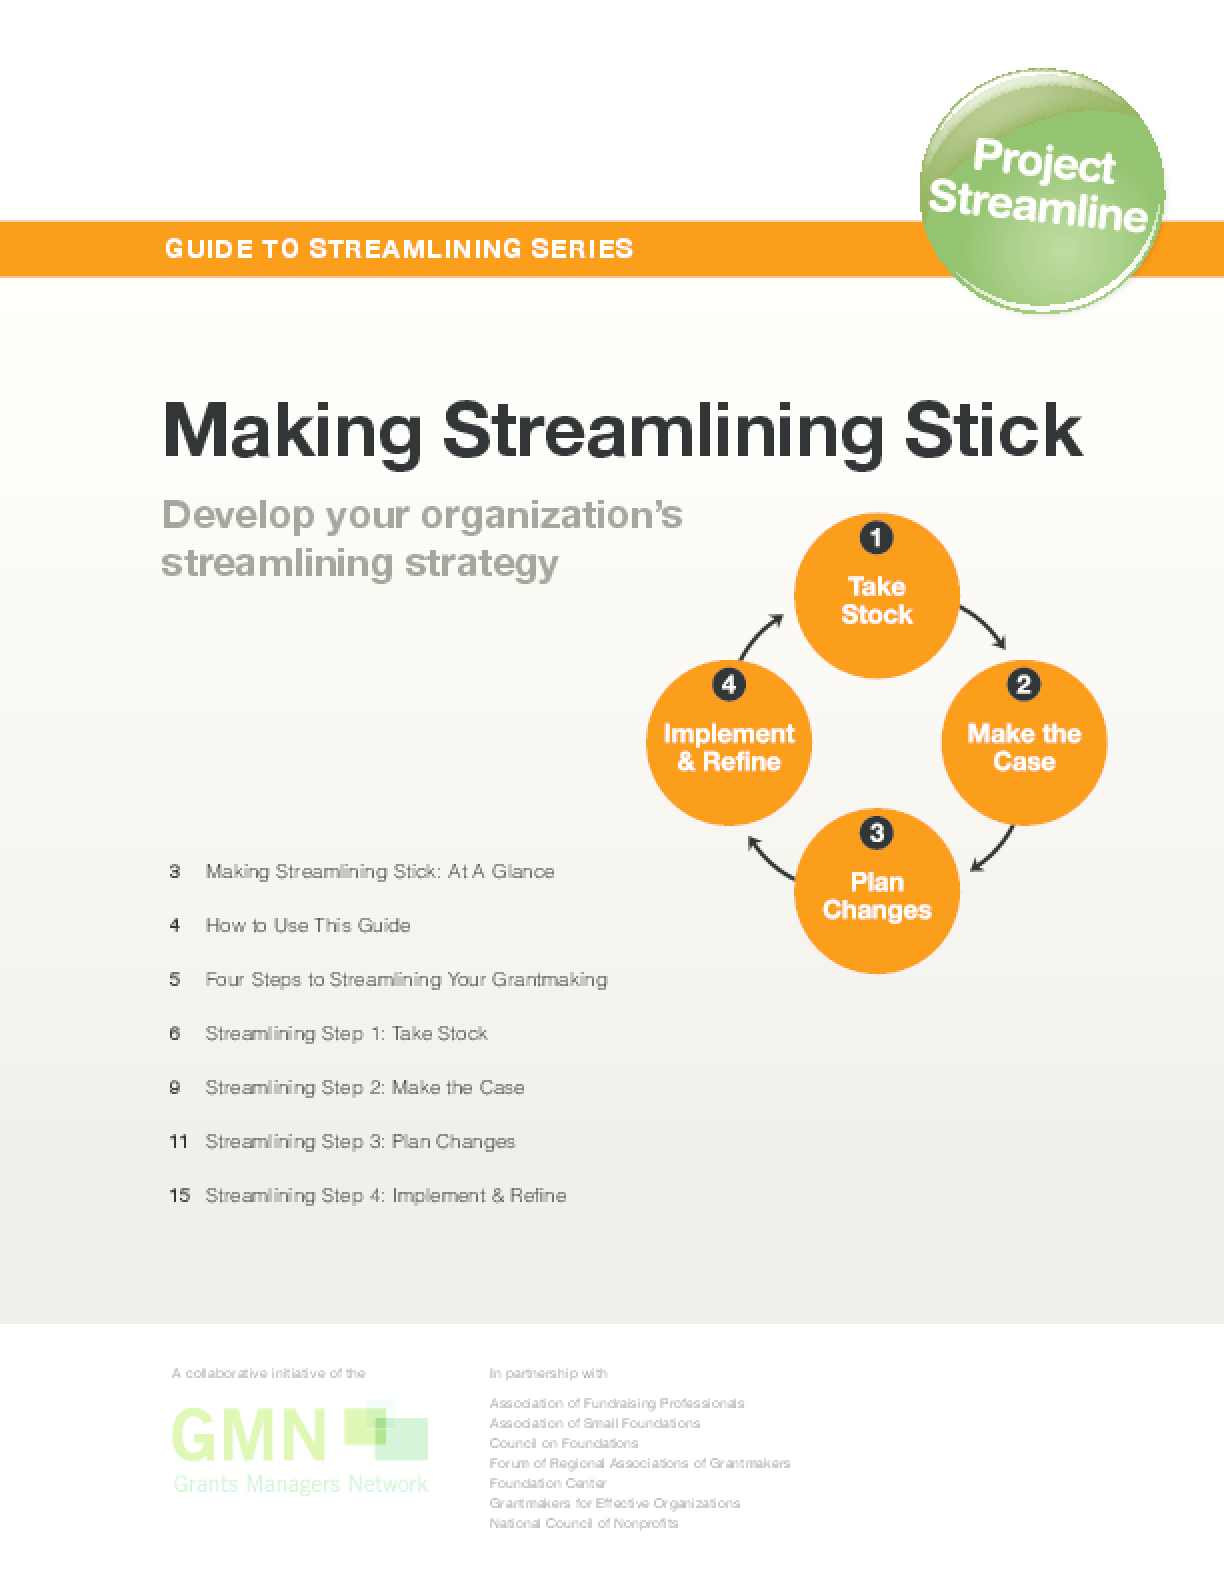 Guide to Streamlining Series: Making Streamlining Stick